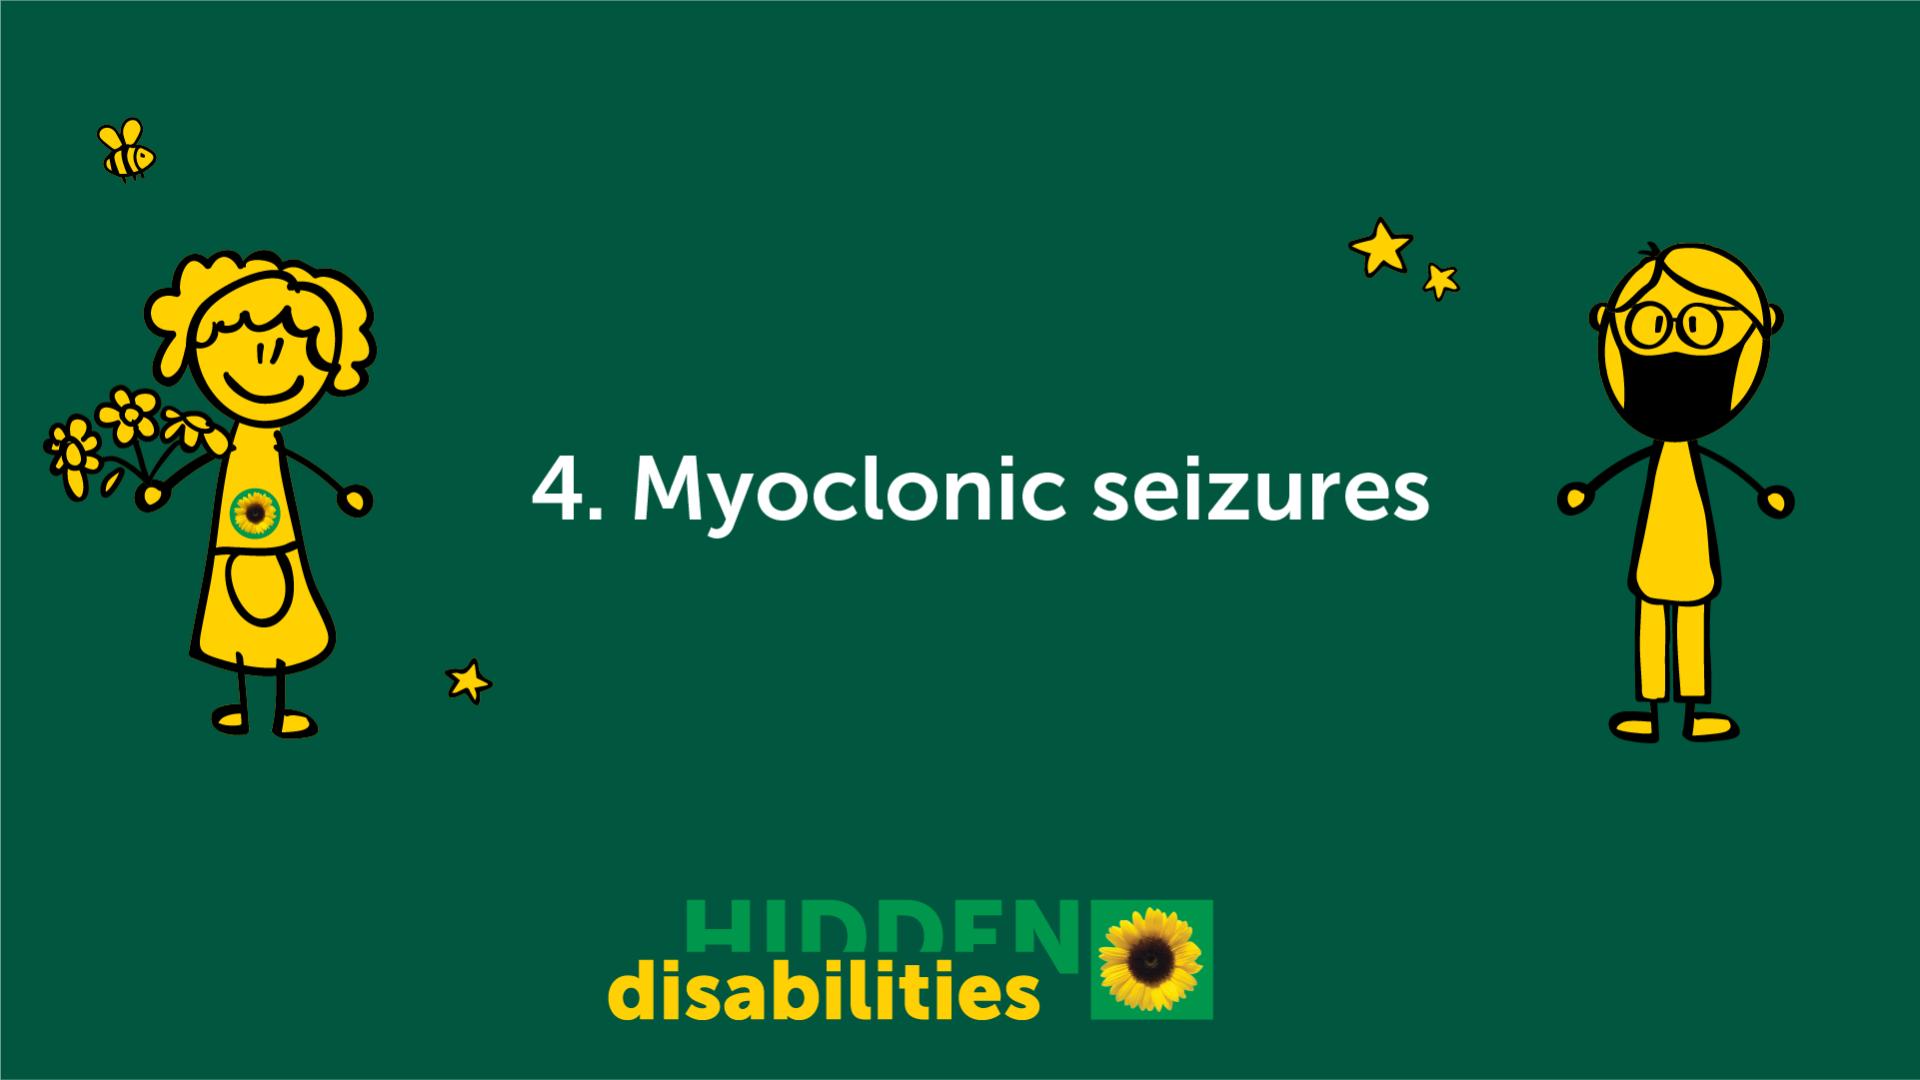 Myoclonic seizures